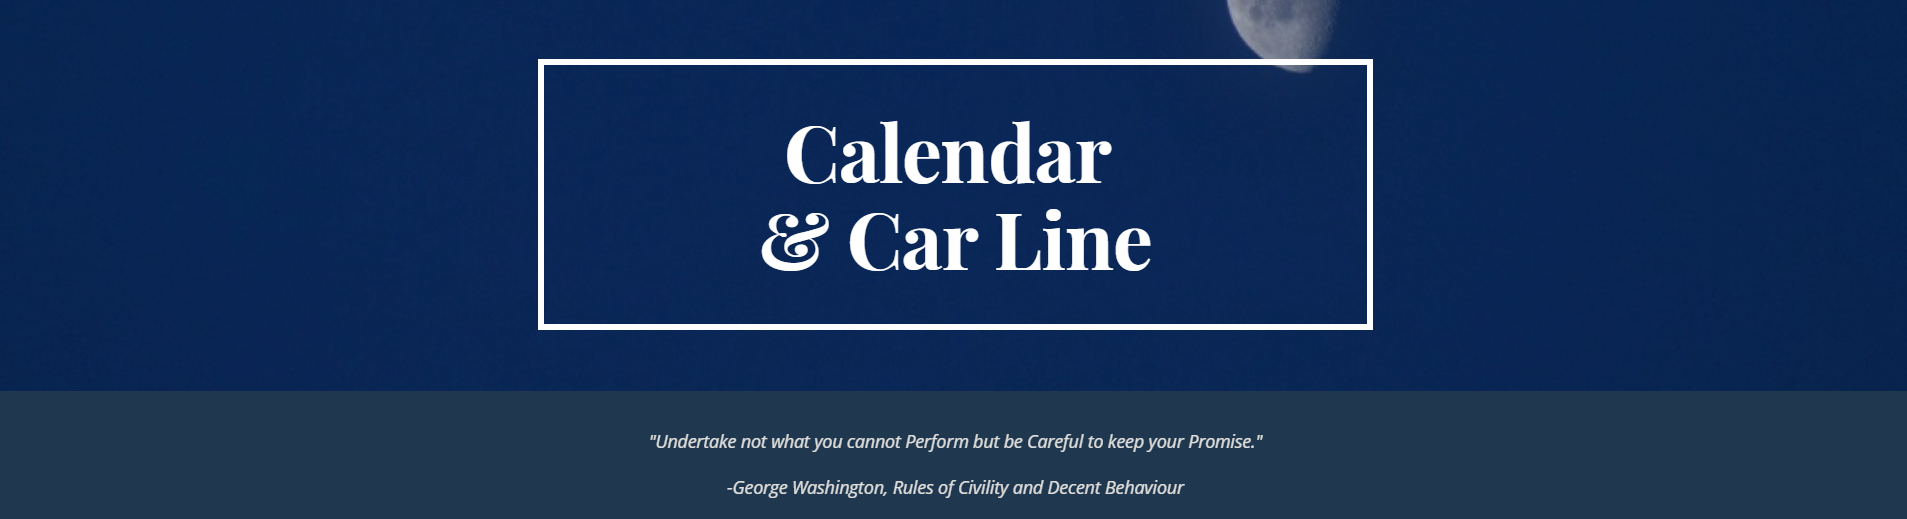 calendar heading